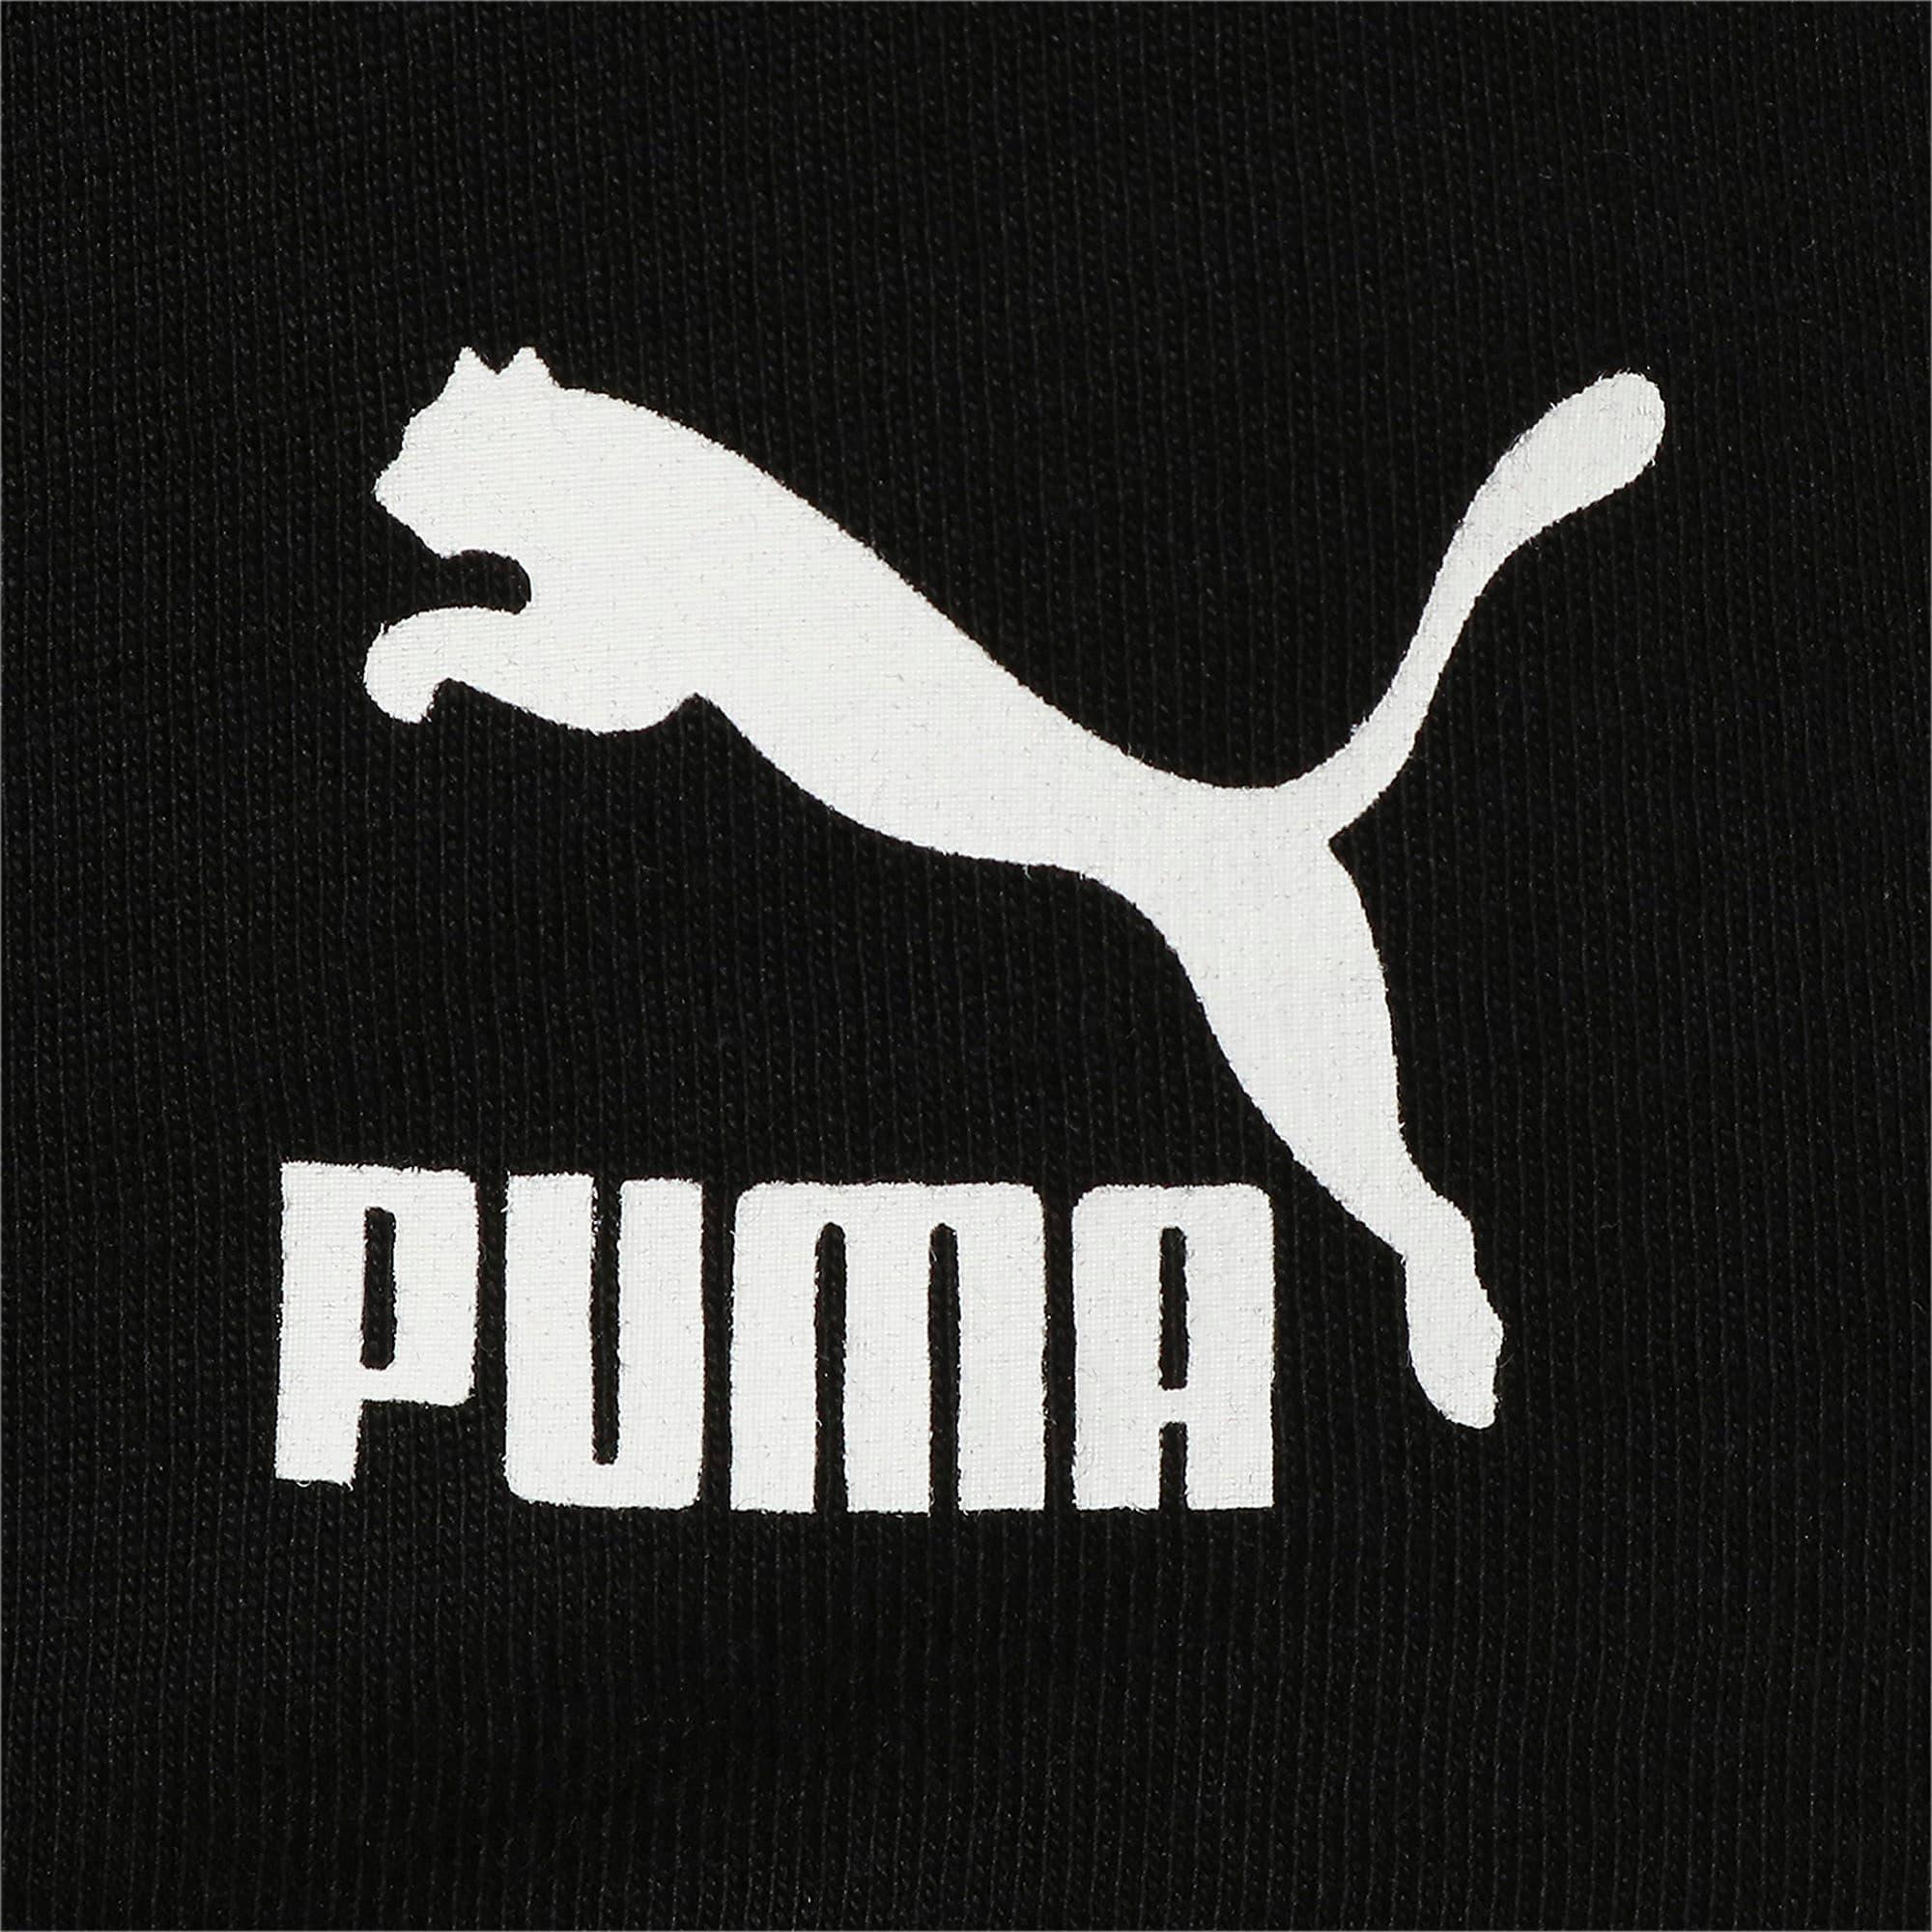 Thumbnail 7 of プーマ XTG ウィメンズ CB SS Tシャツ 半袖, Puma Black, medium-JPN